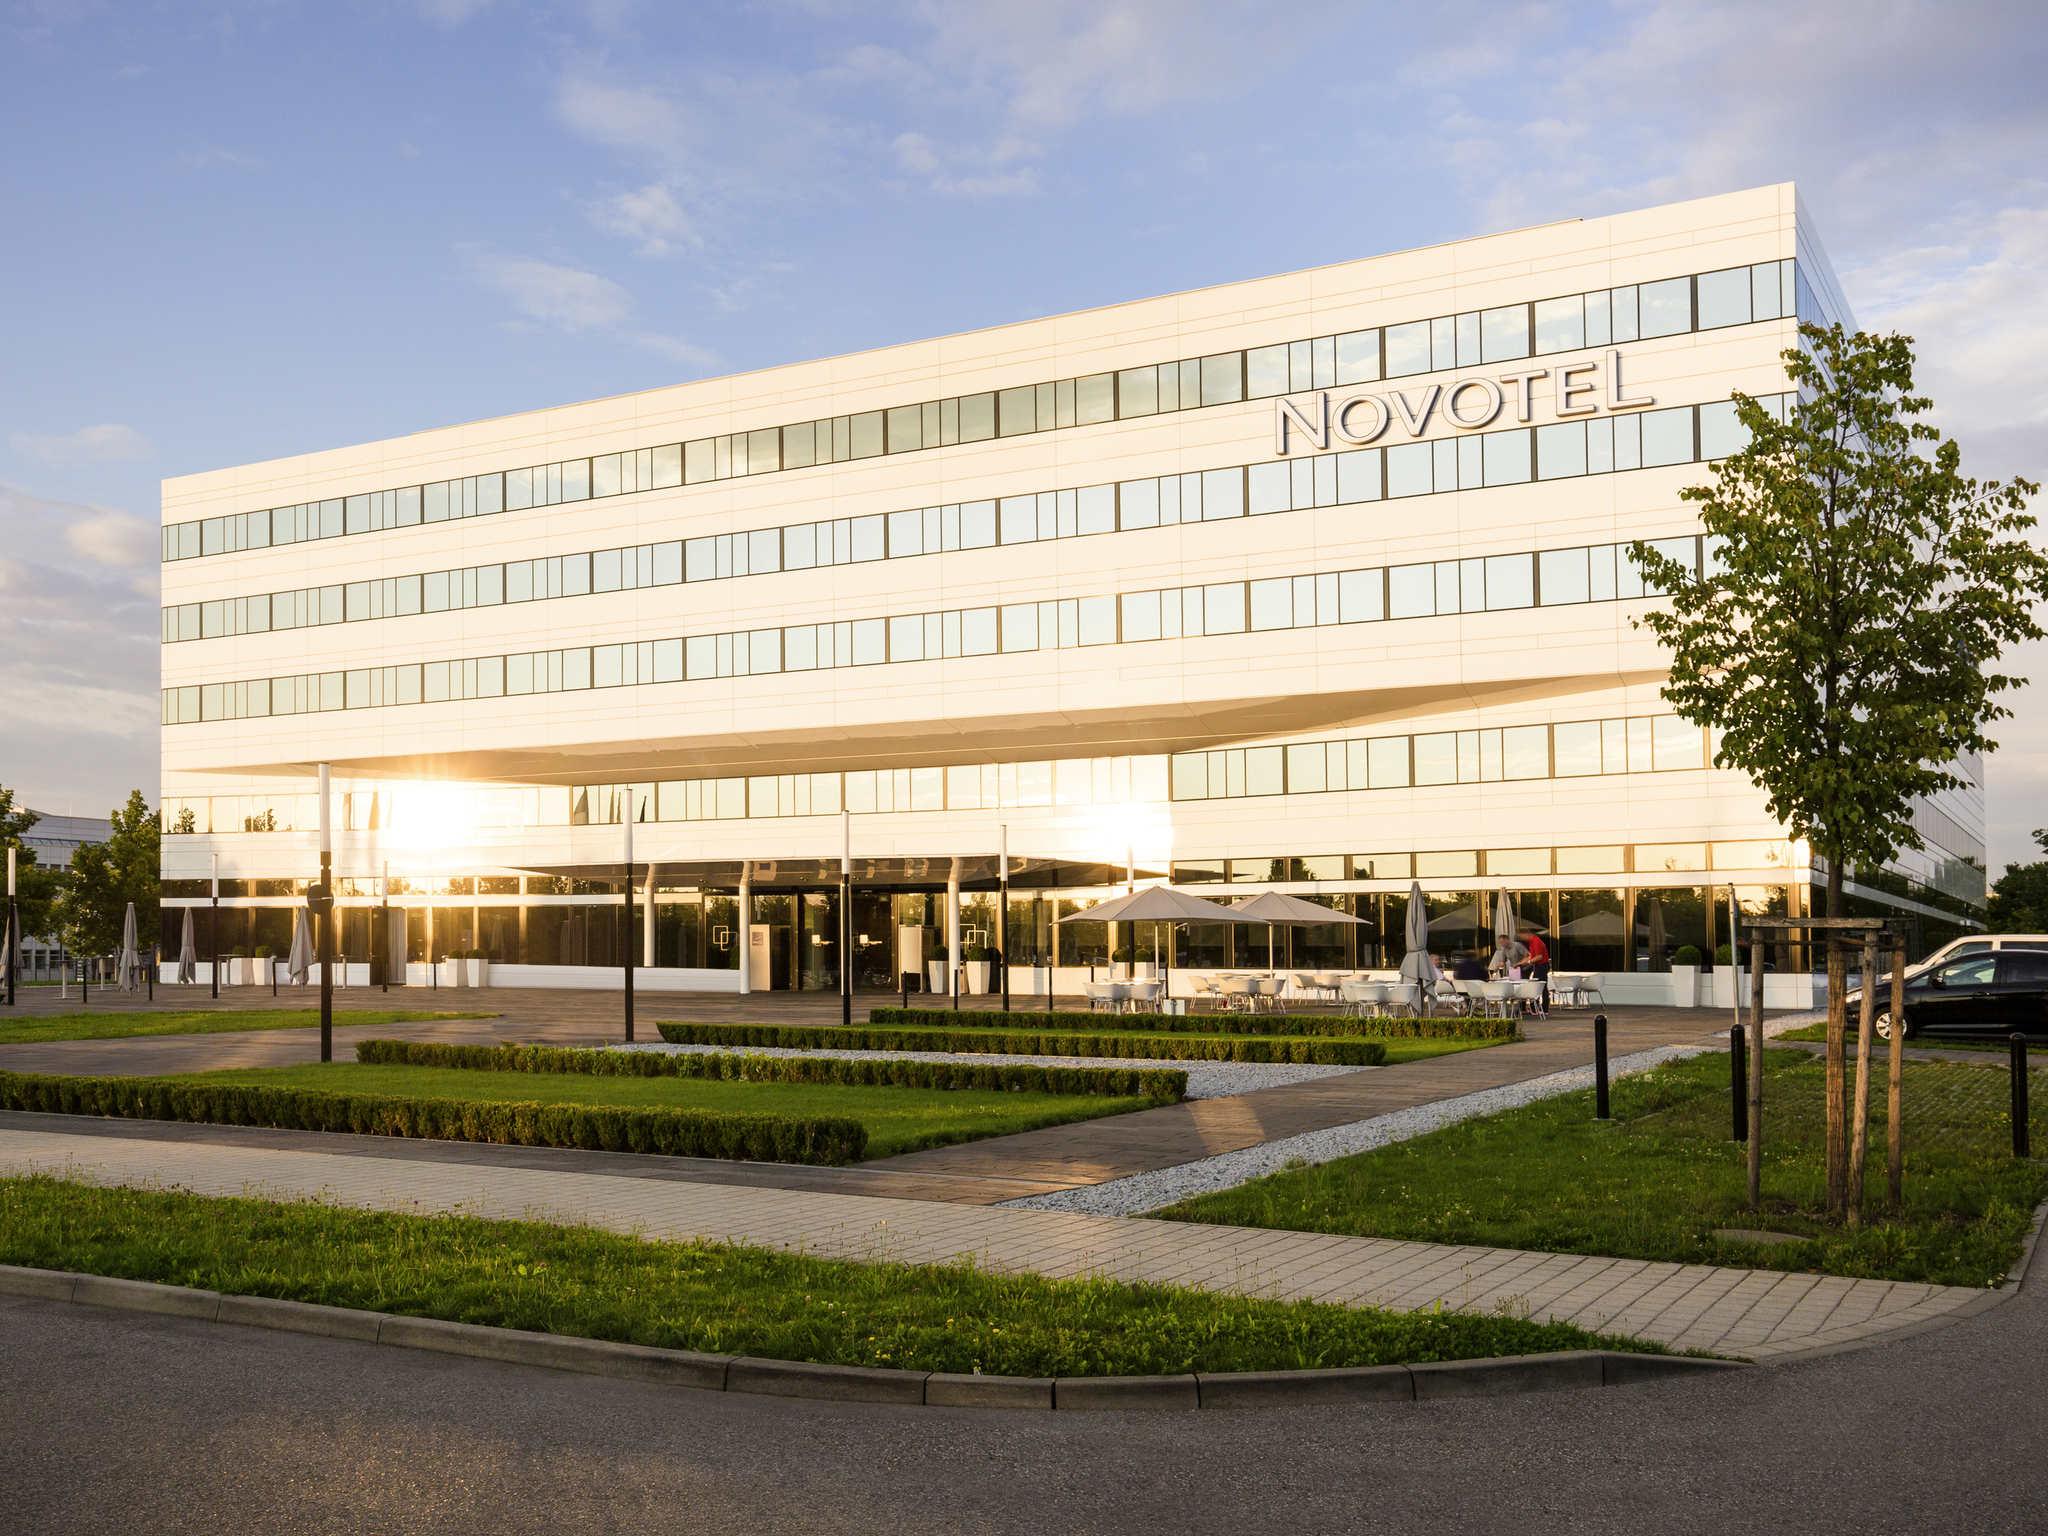 Hotel – Novotel Munique Aeroporto